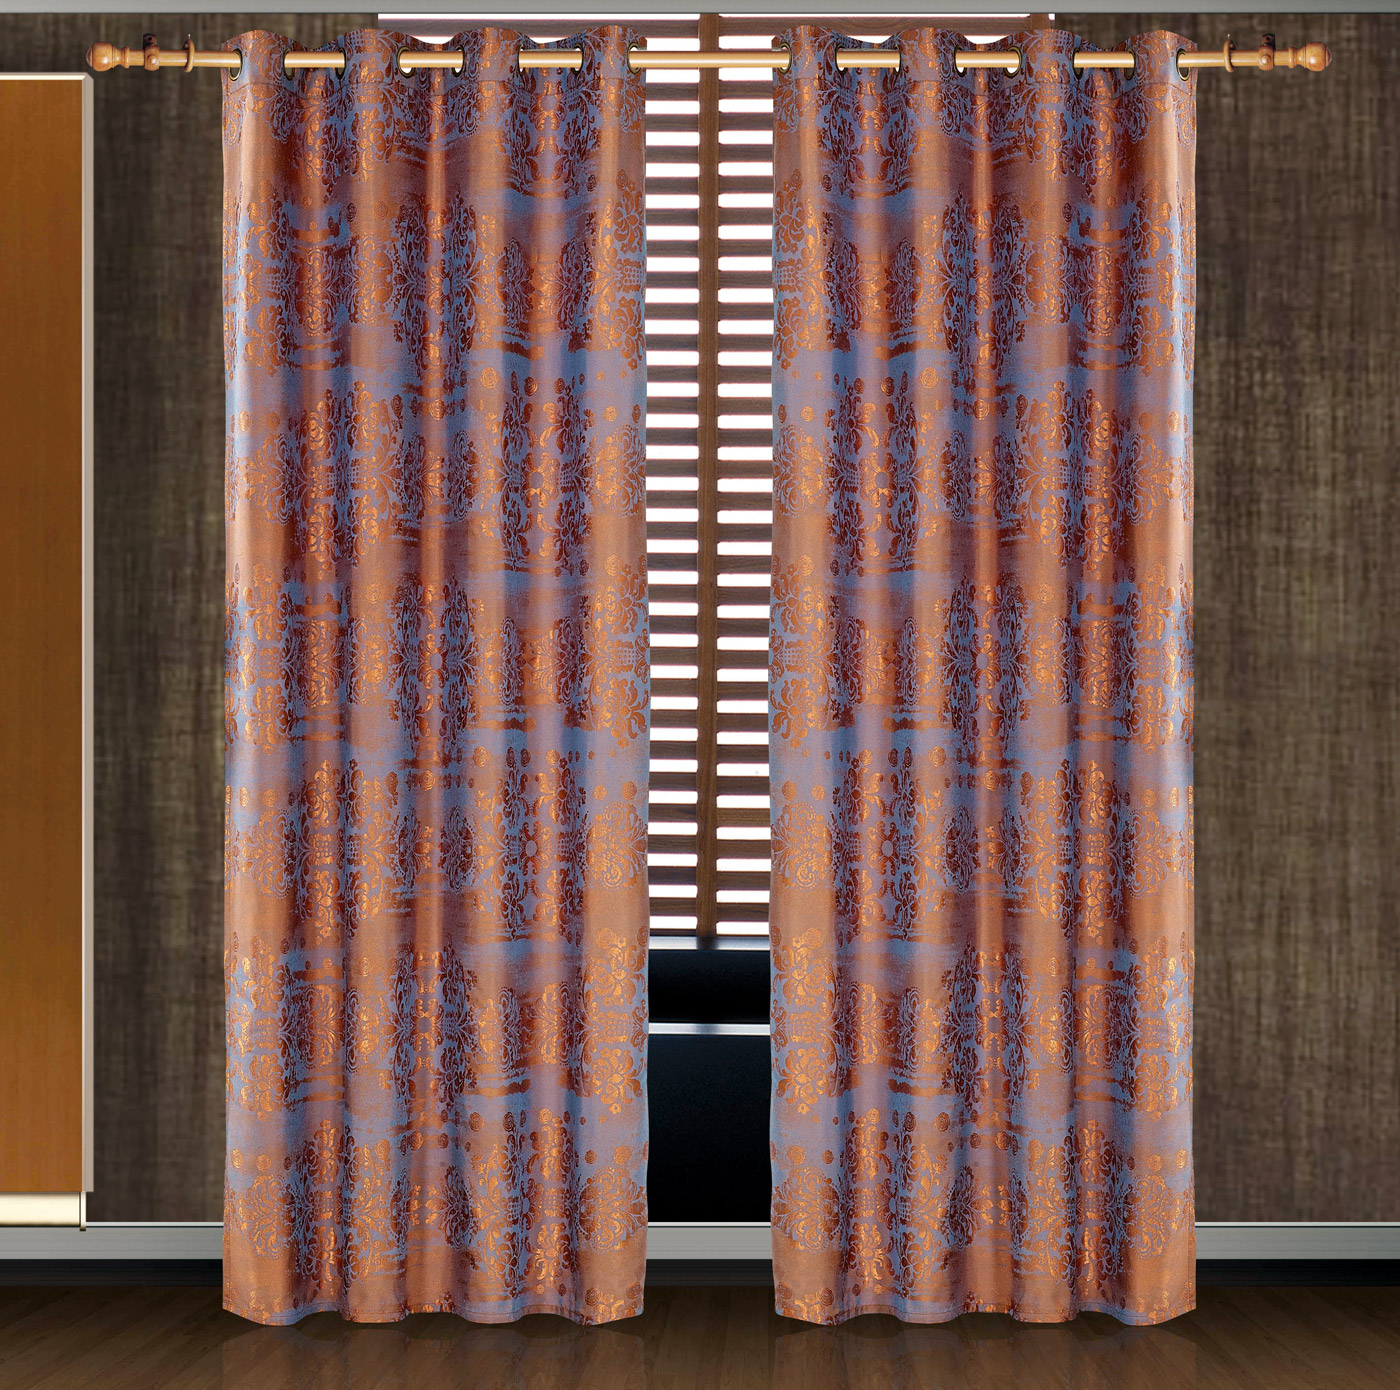 466-Hathor-Dolce-Mela-Window-Treatments-Drapes-Curtain-Panel.jpg